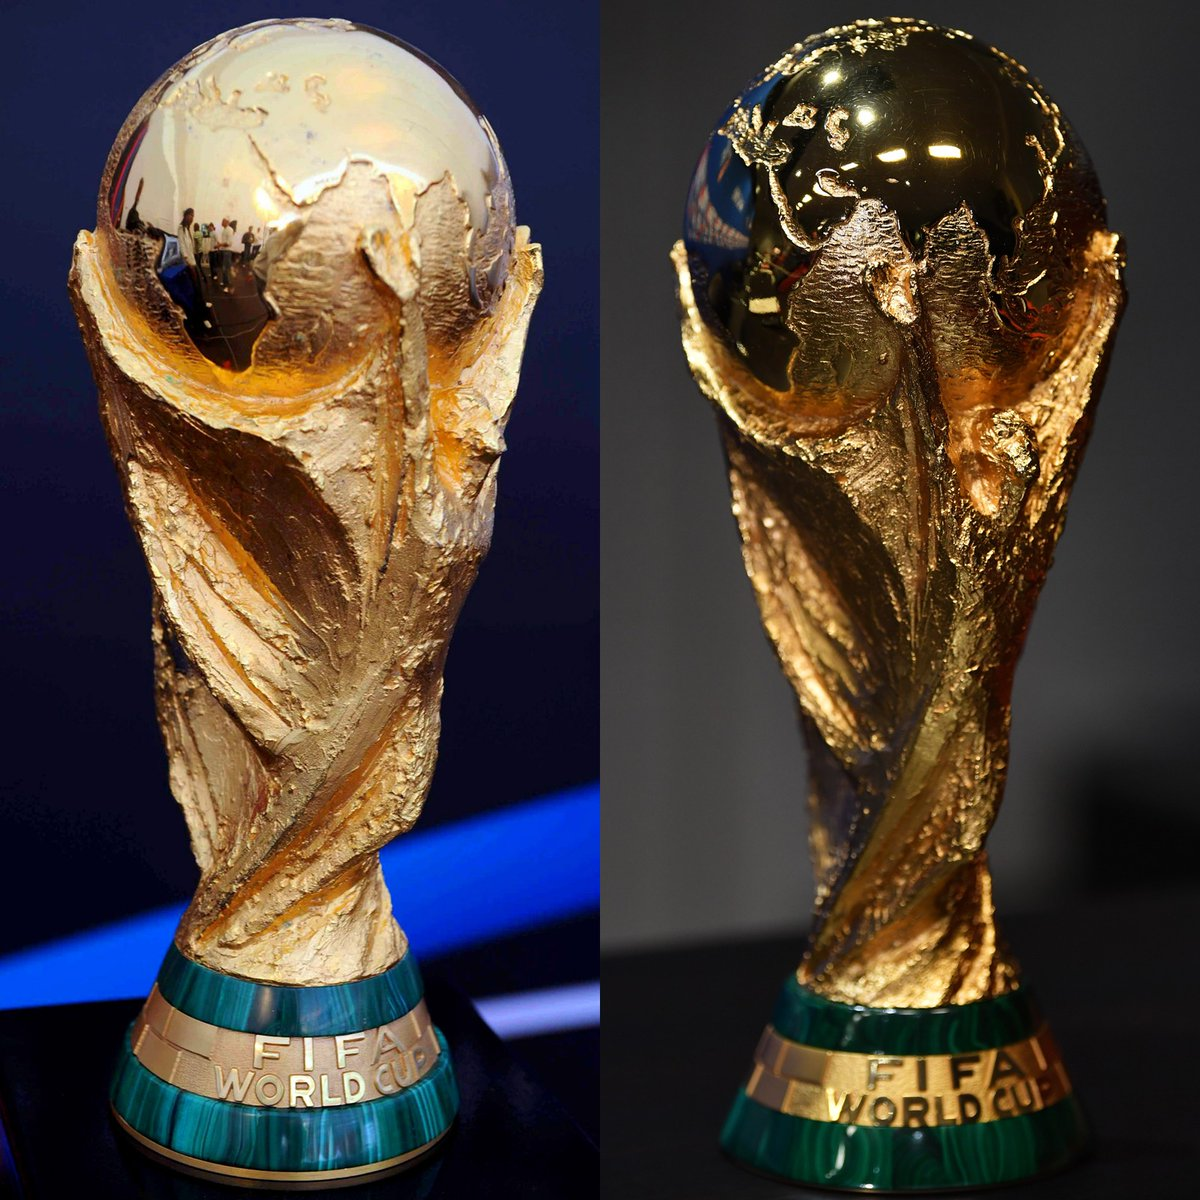 Well played FIFA...  #10yearchallenge #FIFA #OptusSport https://t.co/BQu2STc1xW